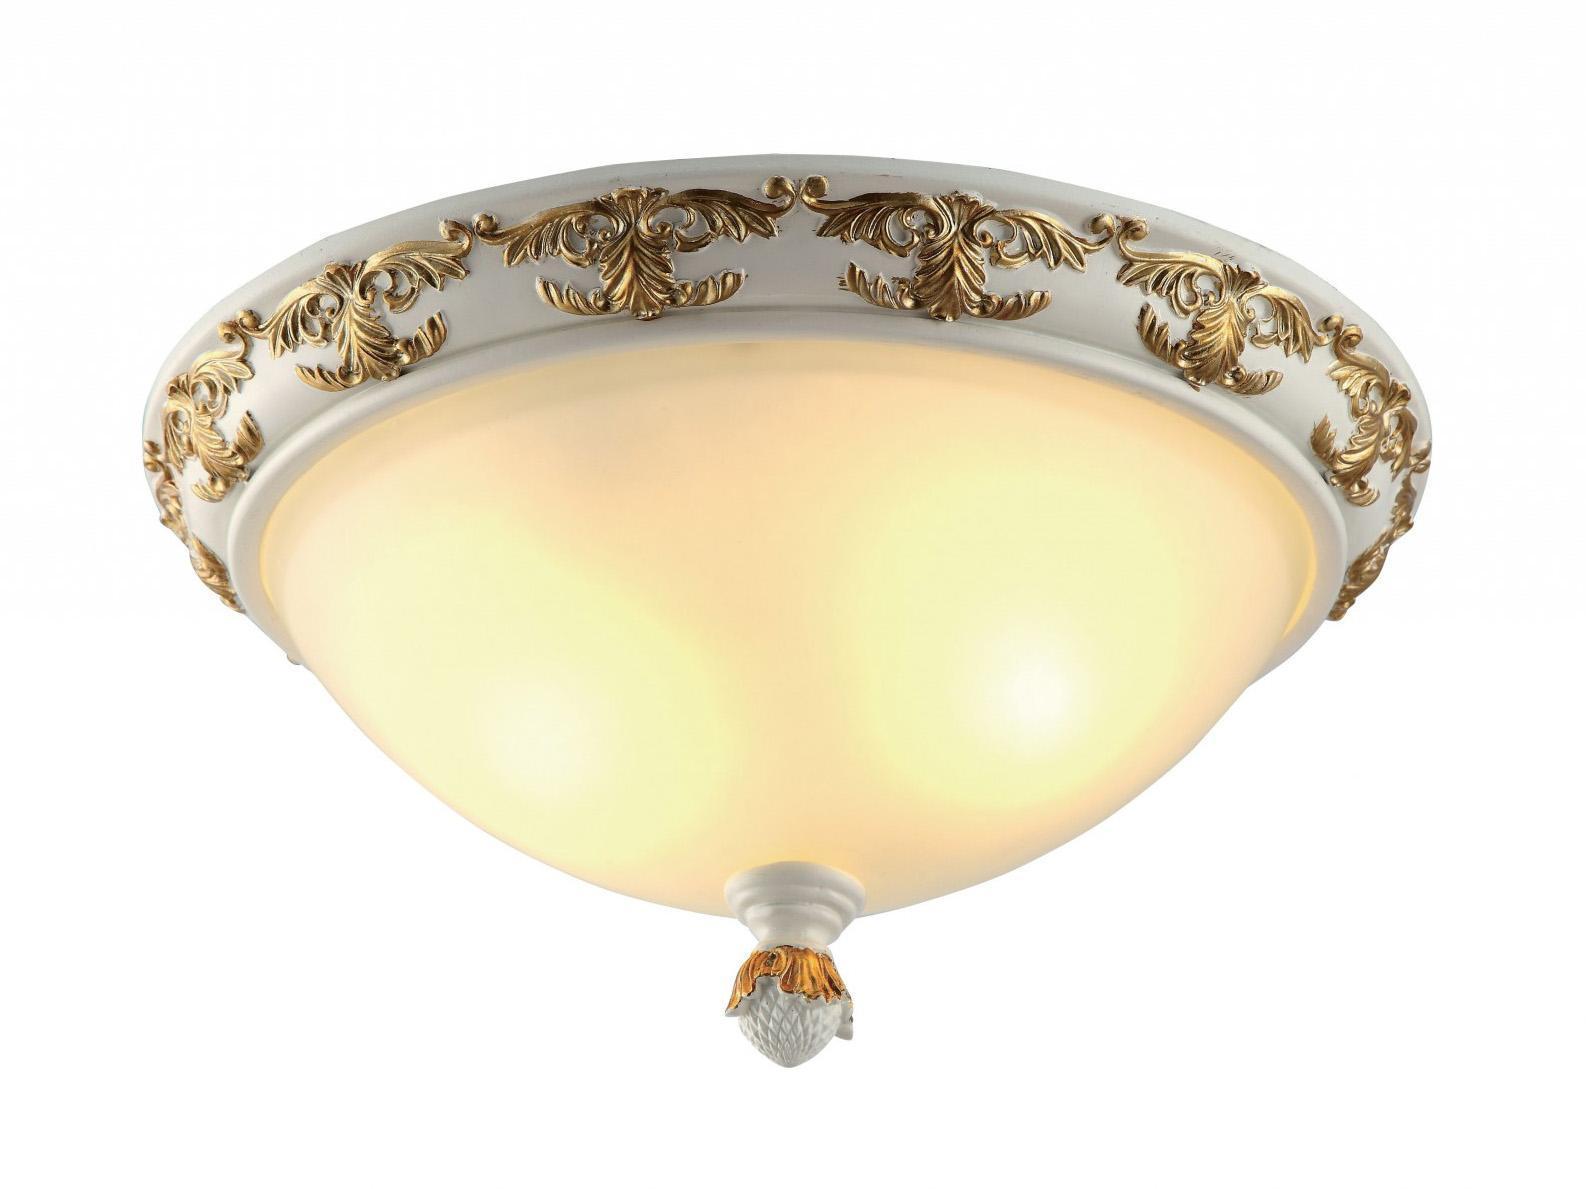 A9570PL-2WG BENESSERE Потолочный светильник люстра на штанге arte lamp benessere a9570pl 5wg